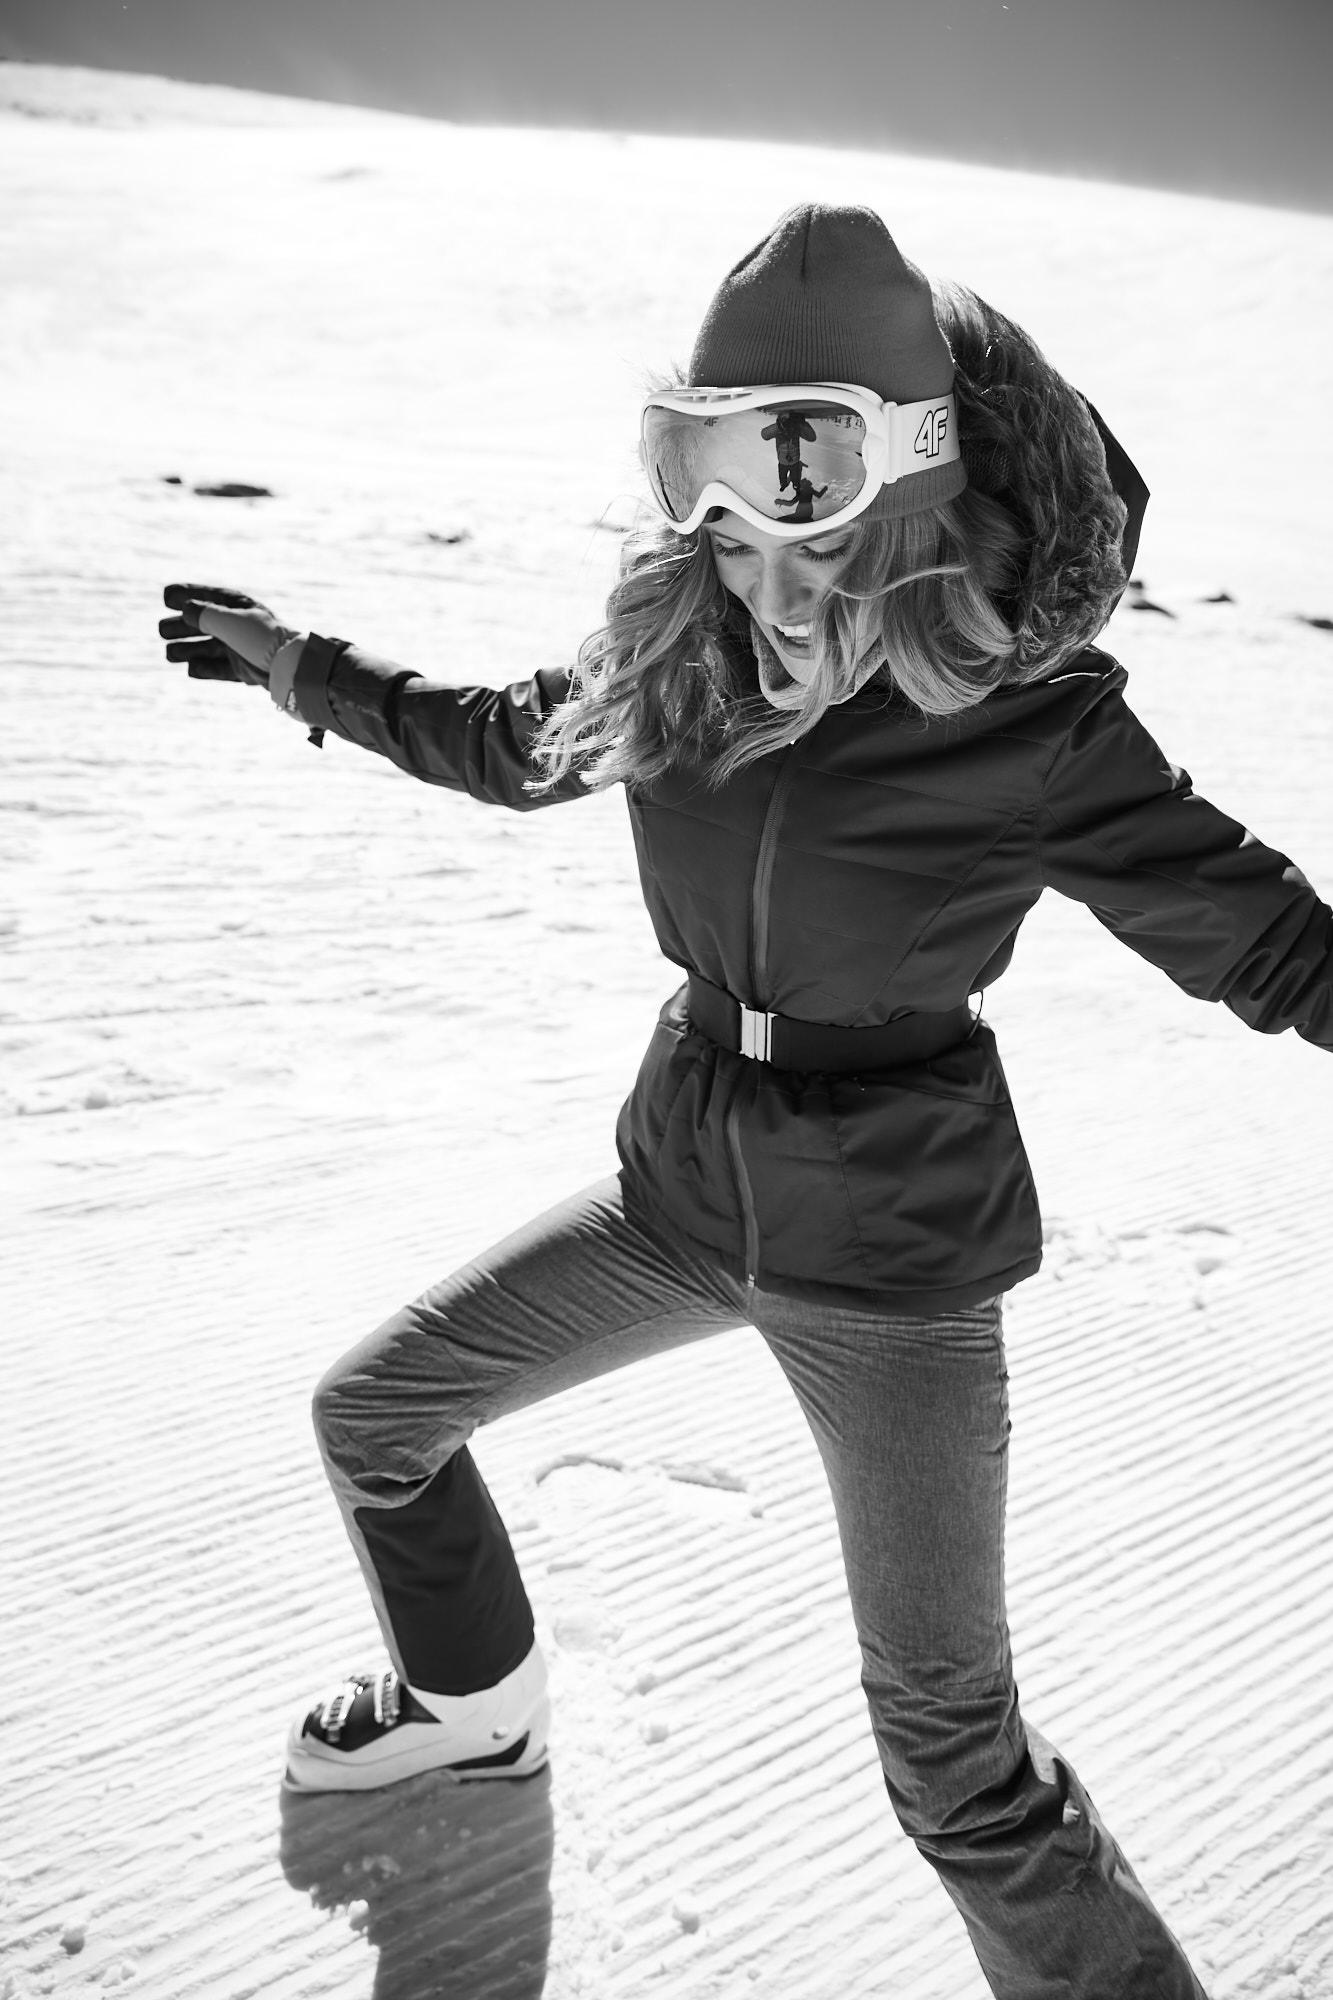 sportswear outhorn sierra nevada